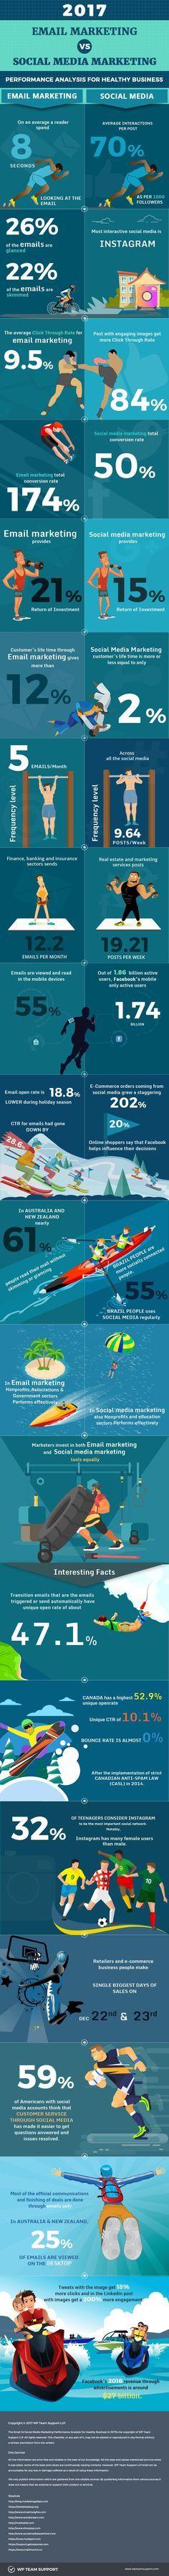 2017 Email Marketing Vs Social Media Marketing #Infographic #EmailMarketing #SocialMediaMarketing